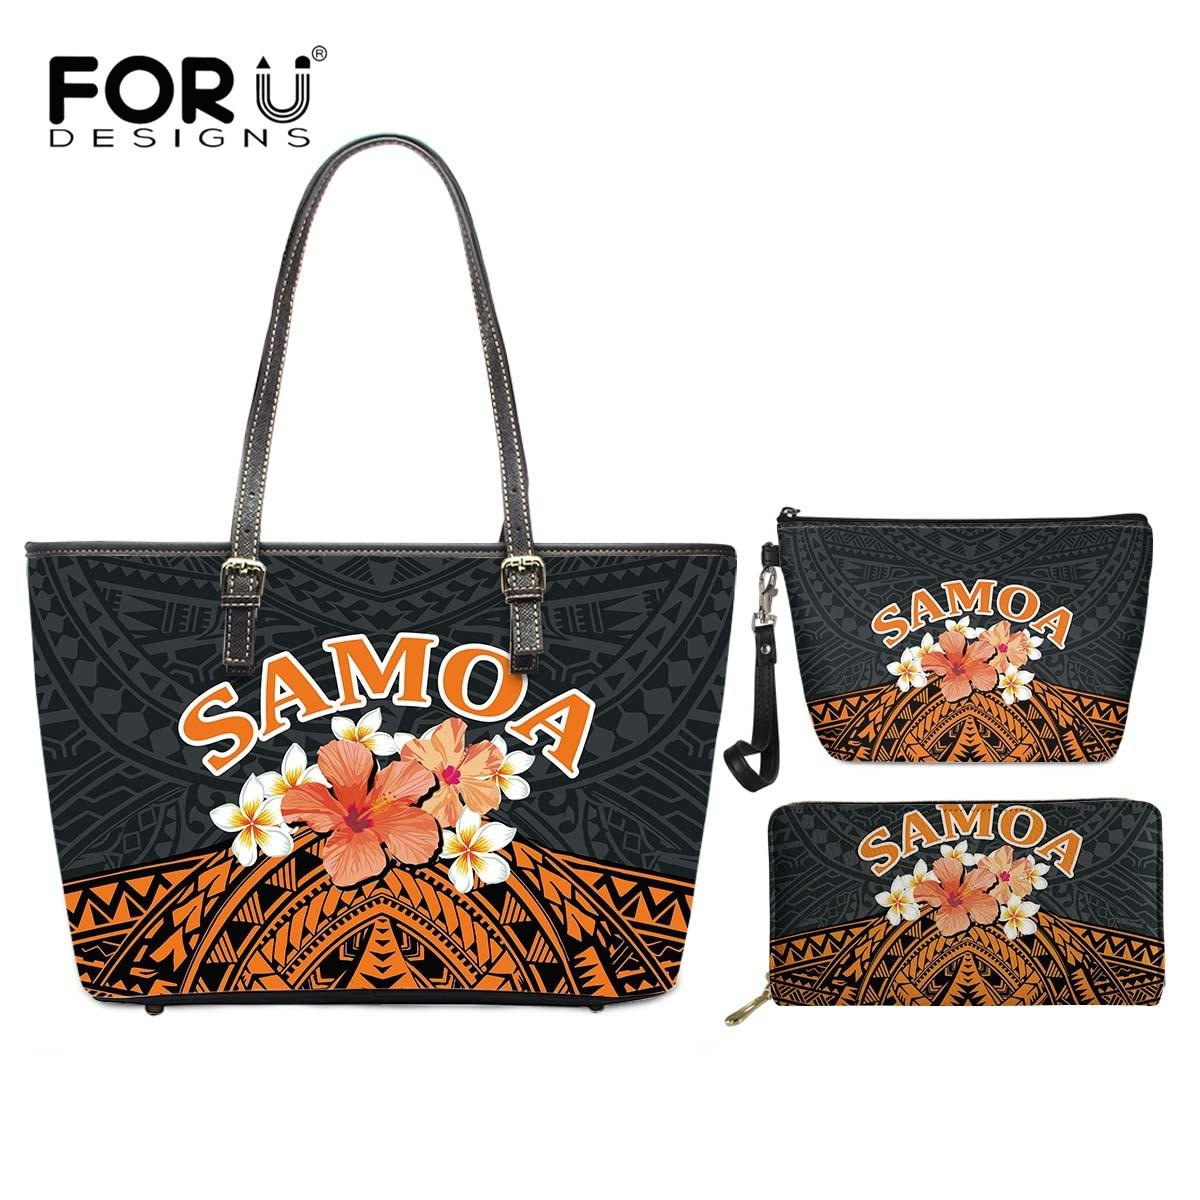 FORUDESIGNS Polynesia Samoa Plumeria Print Leather PU Tote Bag and Wallet Set Small Cosmatic Bag Fashion Woman Handbags 3Pcs